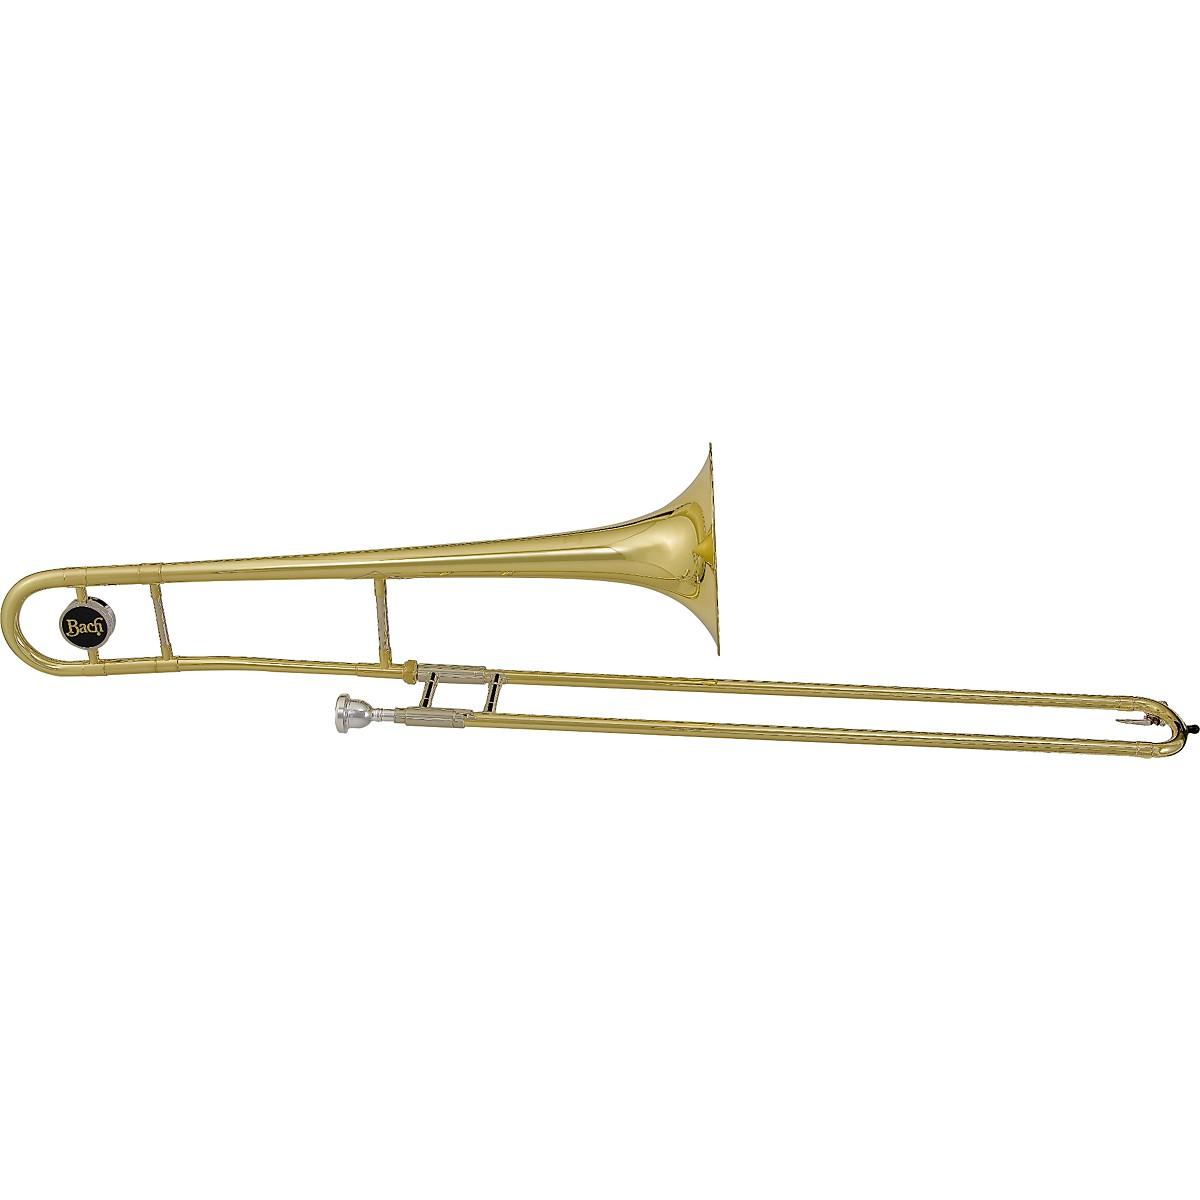 Bach TB301 Student Series Trombone